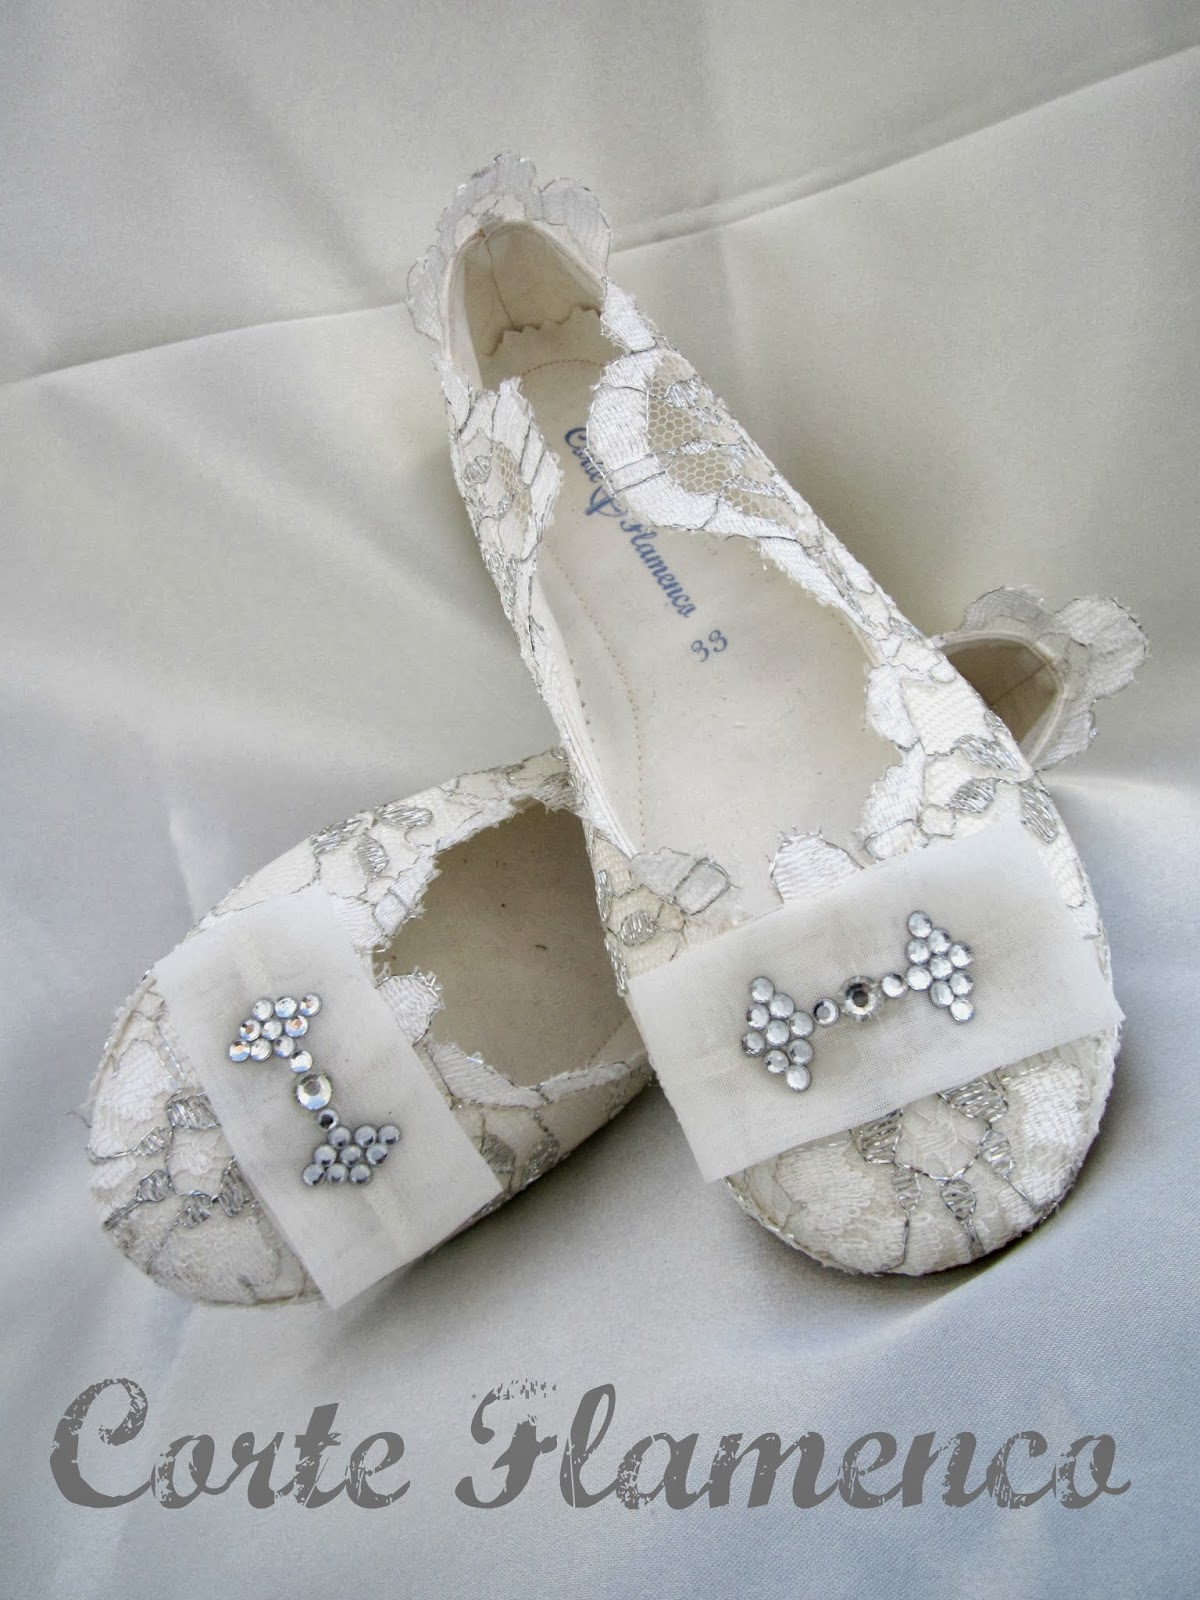 Novedades en zapatos peinados maquillaje vestidos - Ideas para decorar zapatos de nina ...